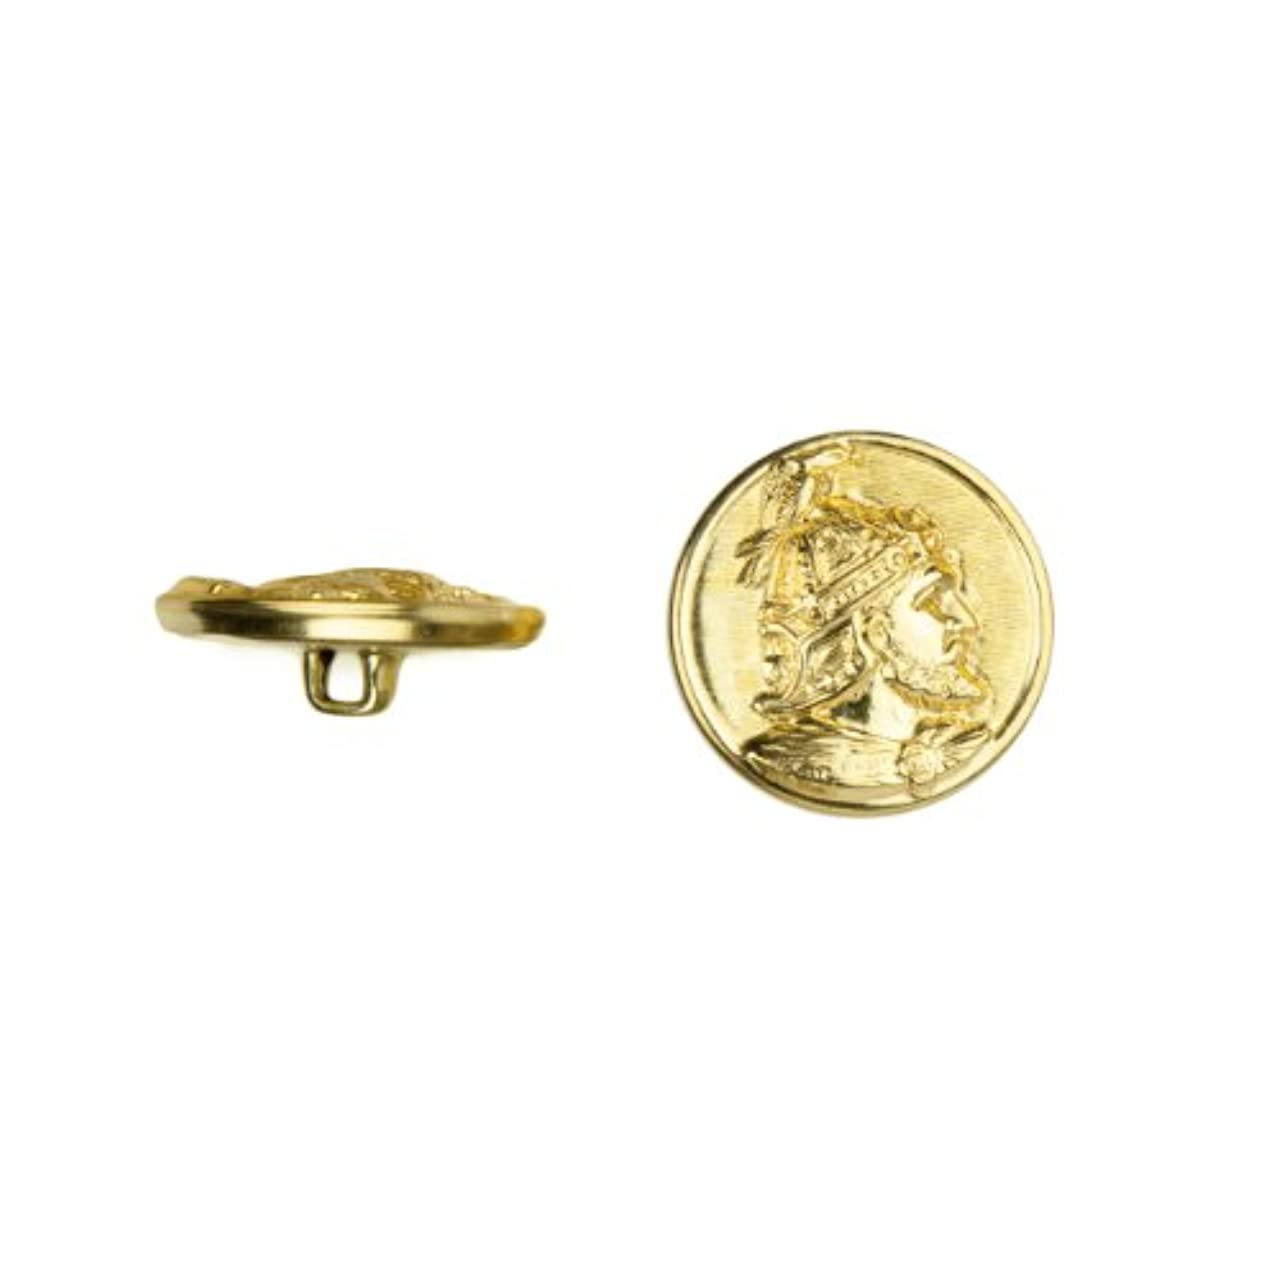 C&C Metal Products 5025 Devonshire Metal Button, Size 30 Ligne, Gold, 36-Pack